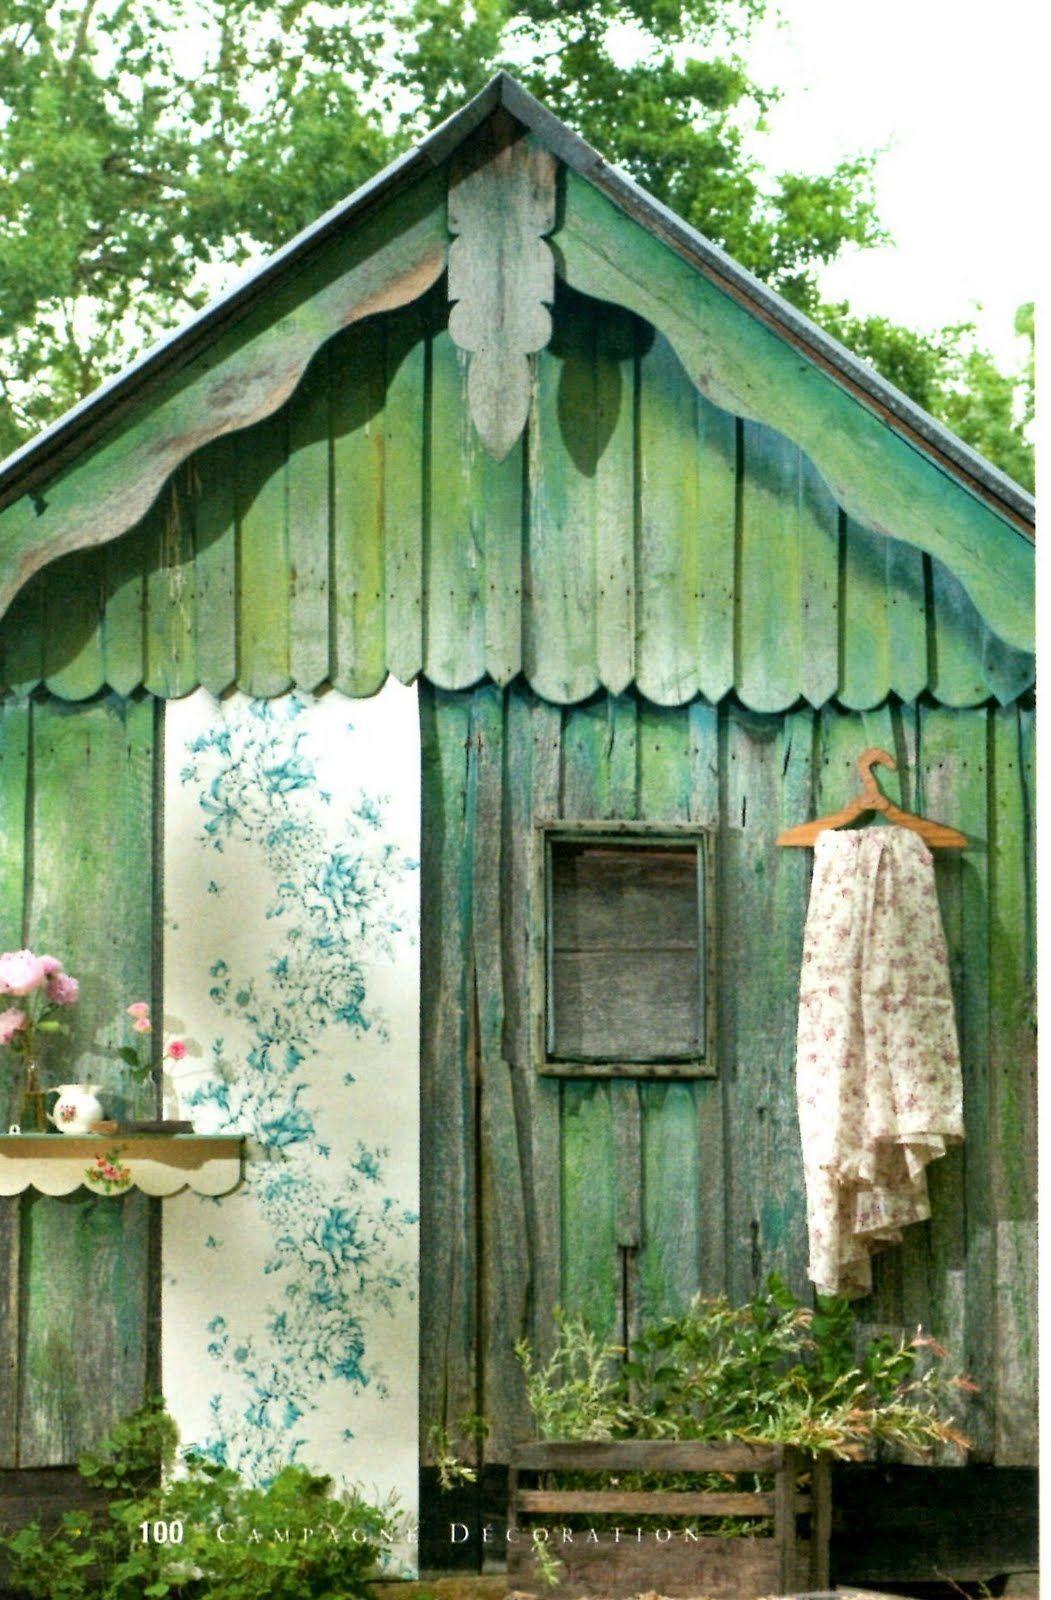 le monde de catherine ma cabane garden sheds - Garden Sheds Massachusetts